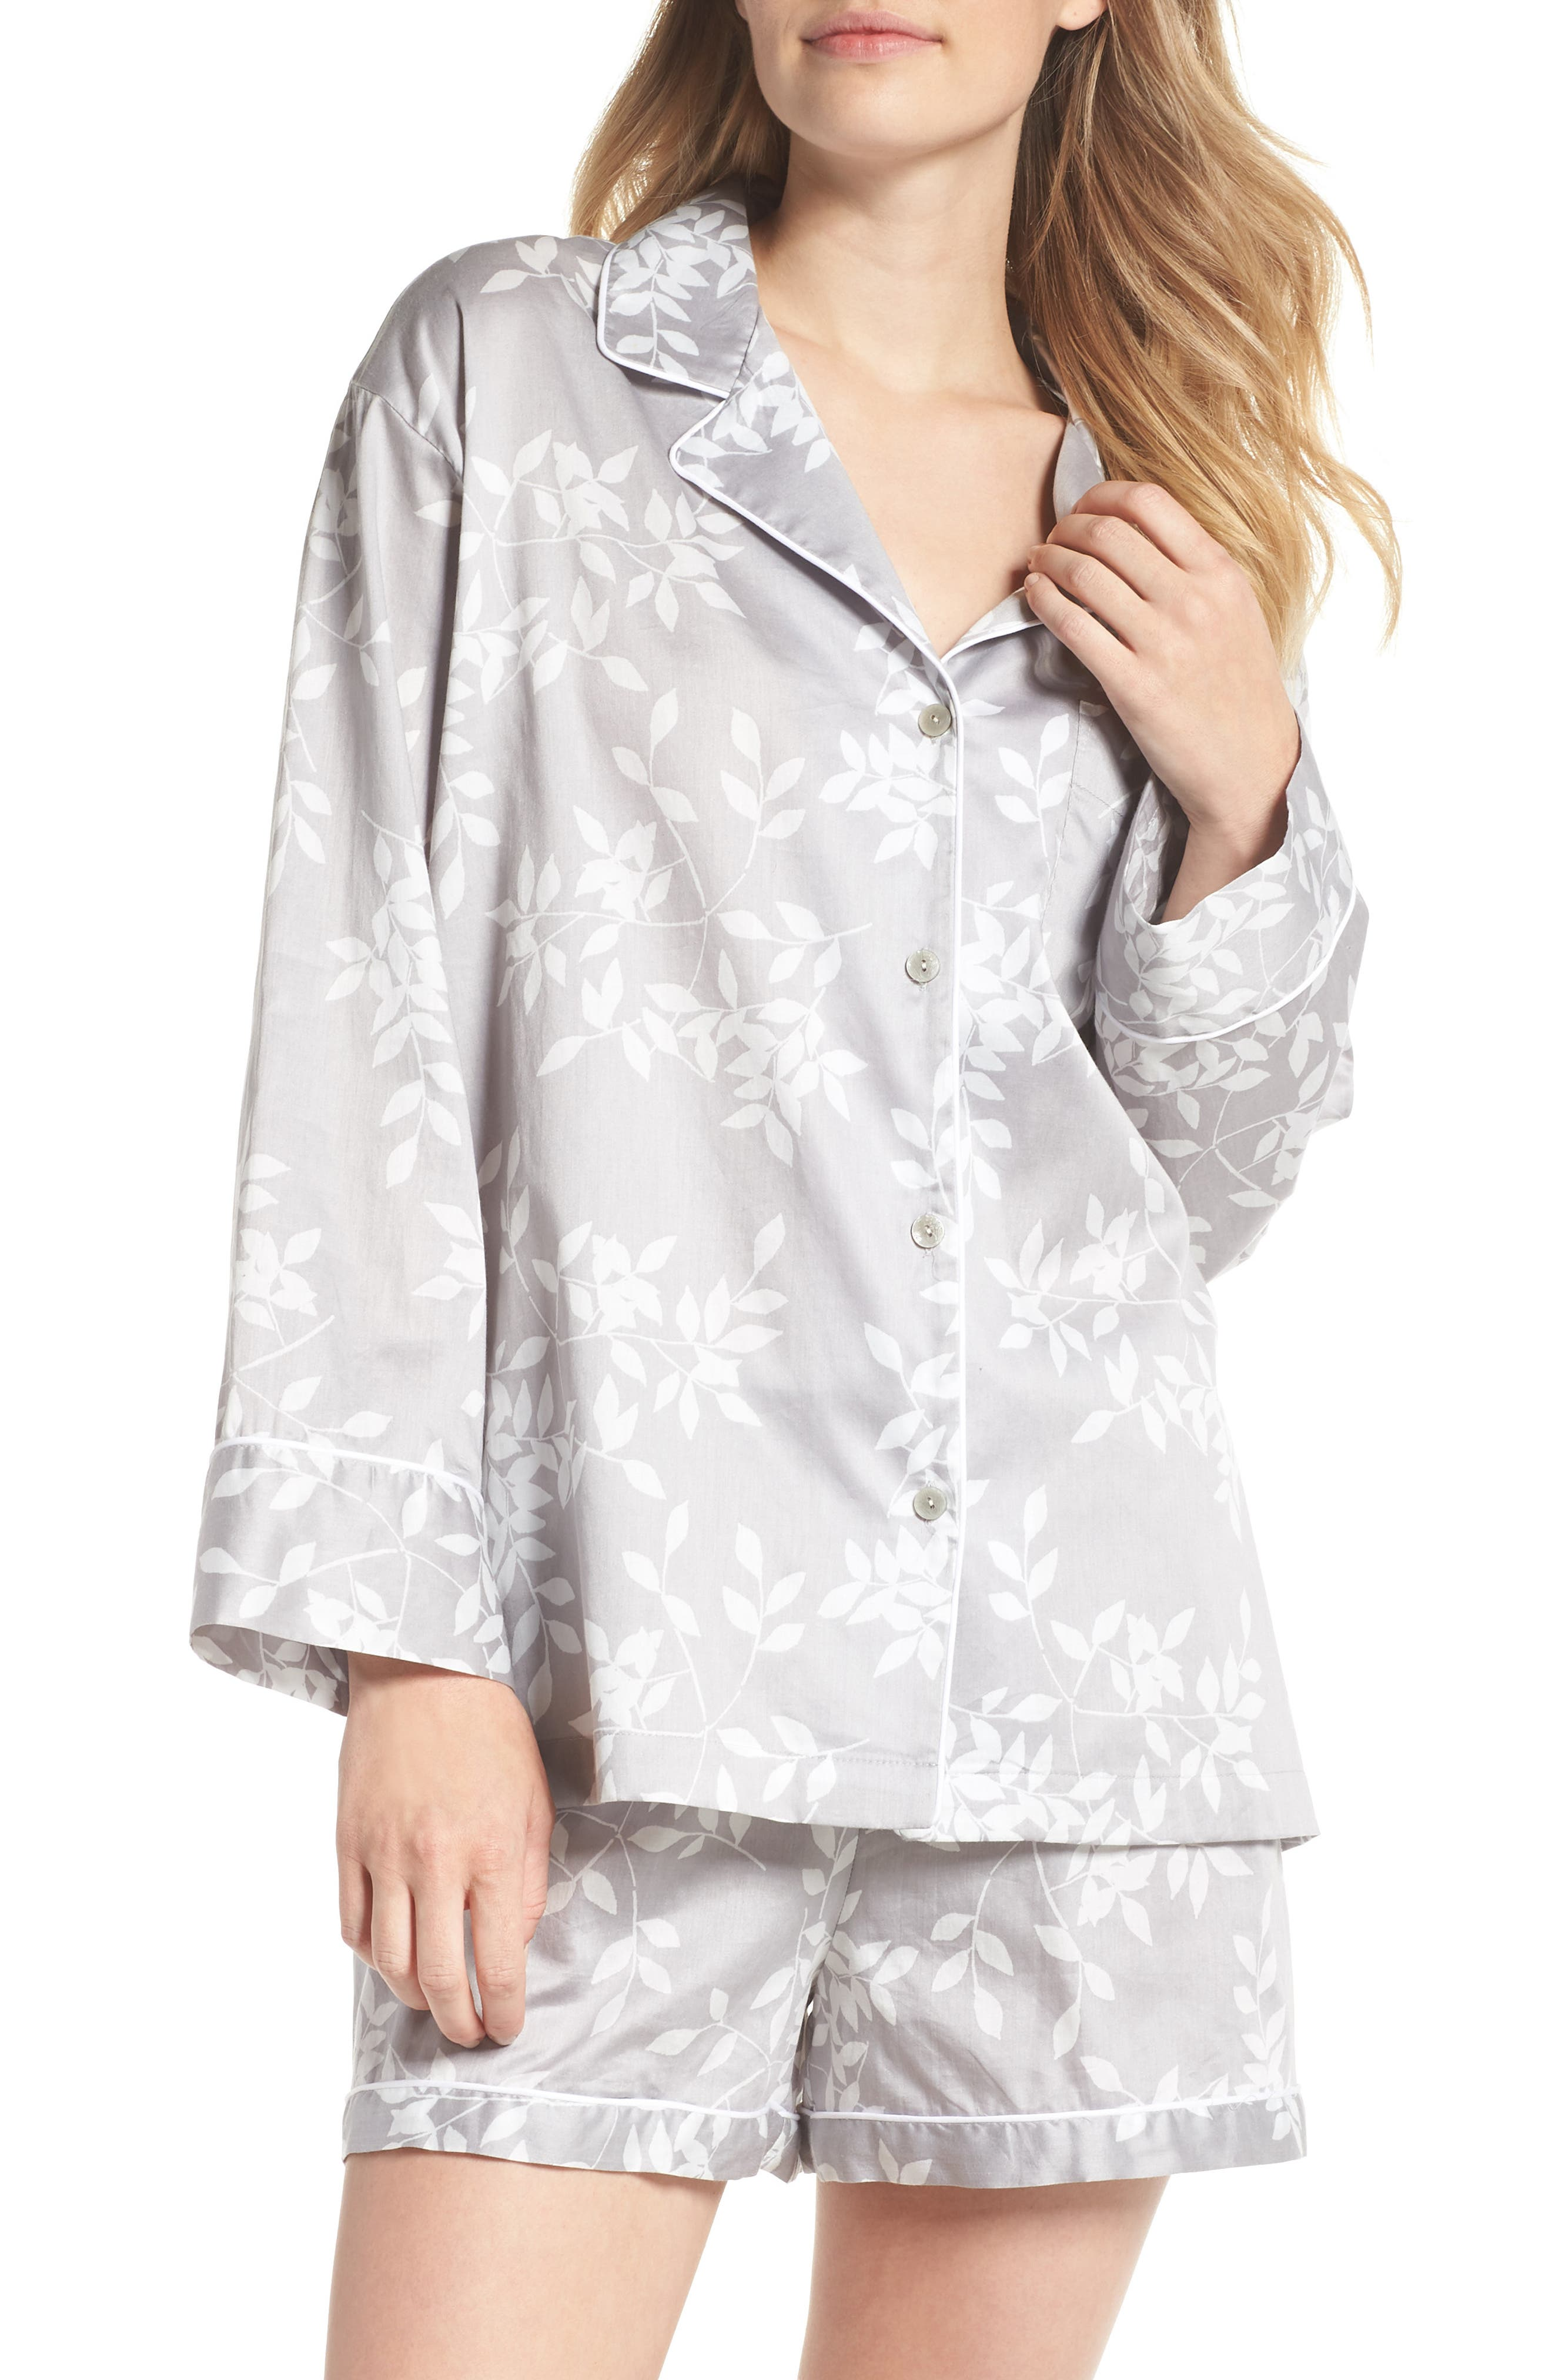 Branch Print Cotton Sateen Short Pajamas,                             Main thumbnail 1, color,                             021